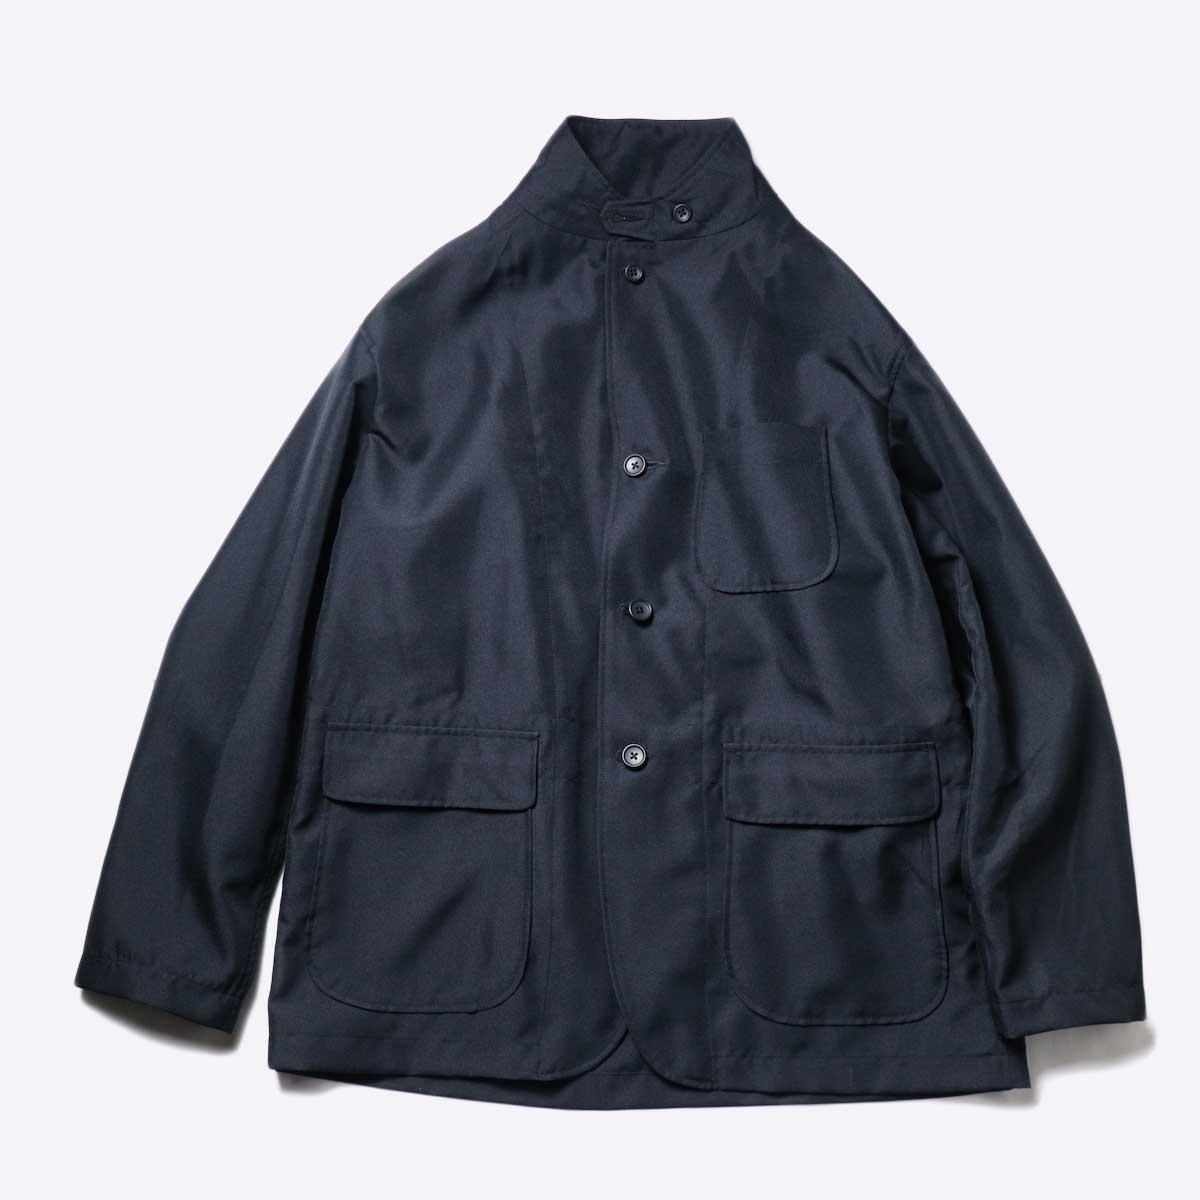 Engineered Garments / Loiter Jacket -Polyester Twill (Black)襟立てた場合